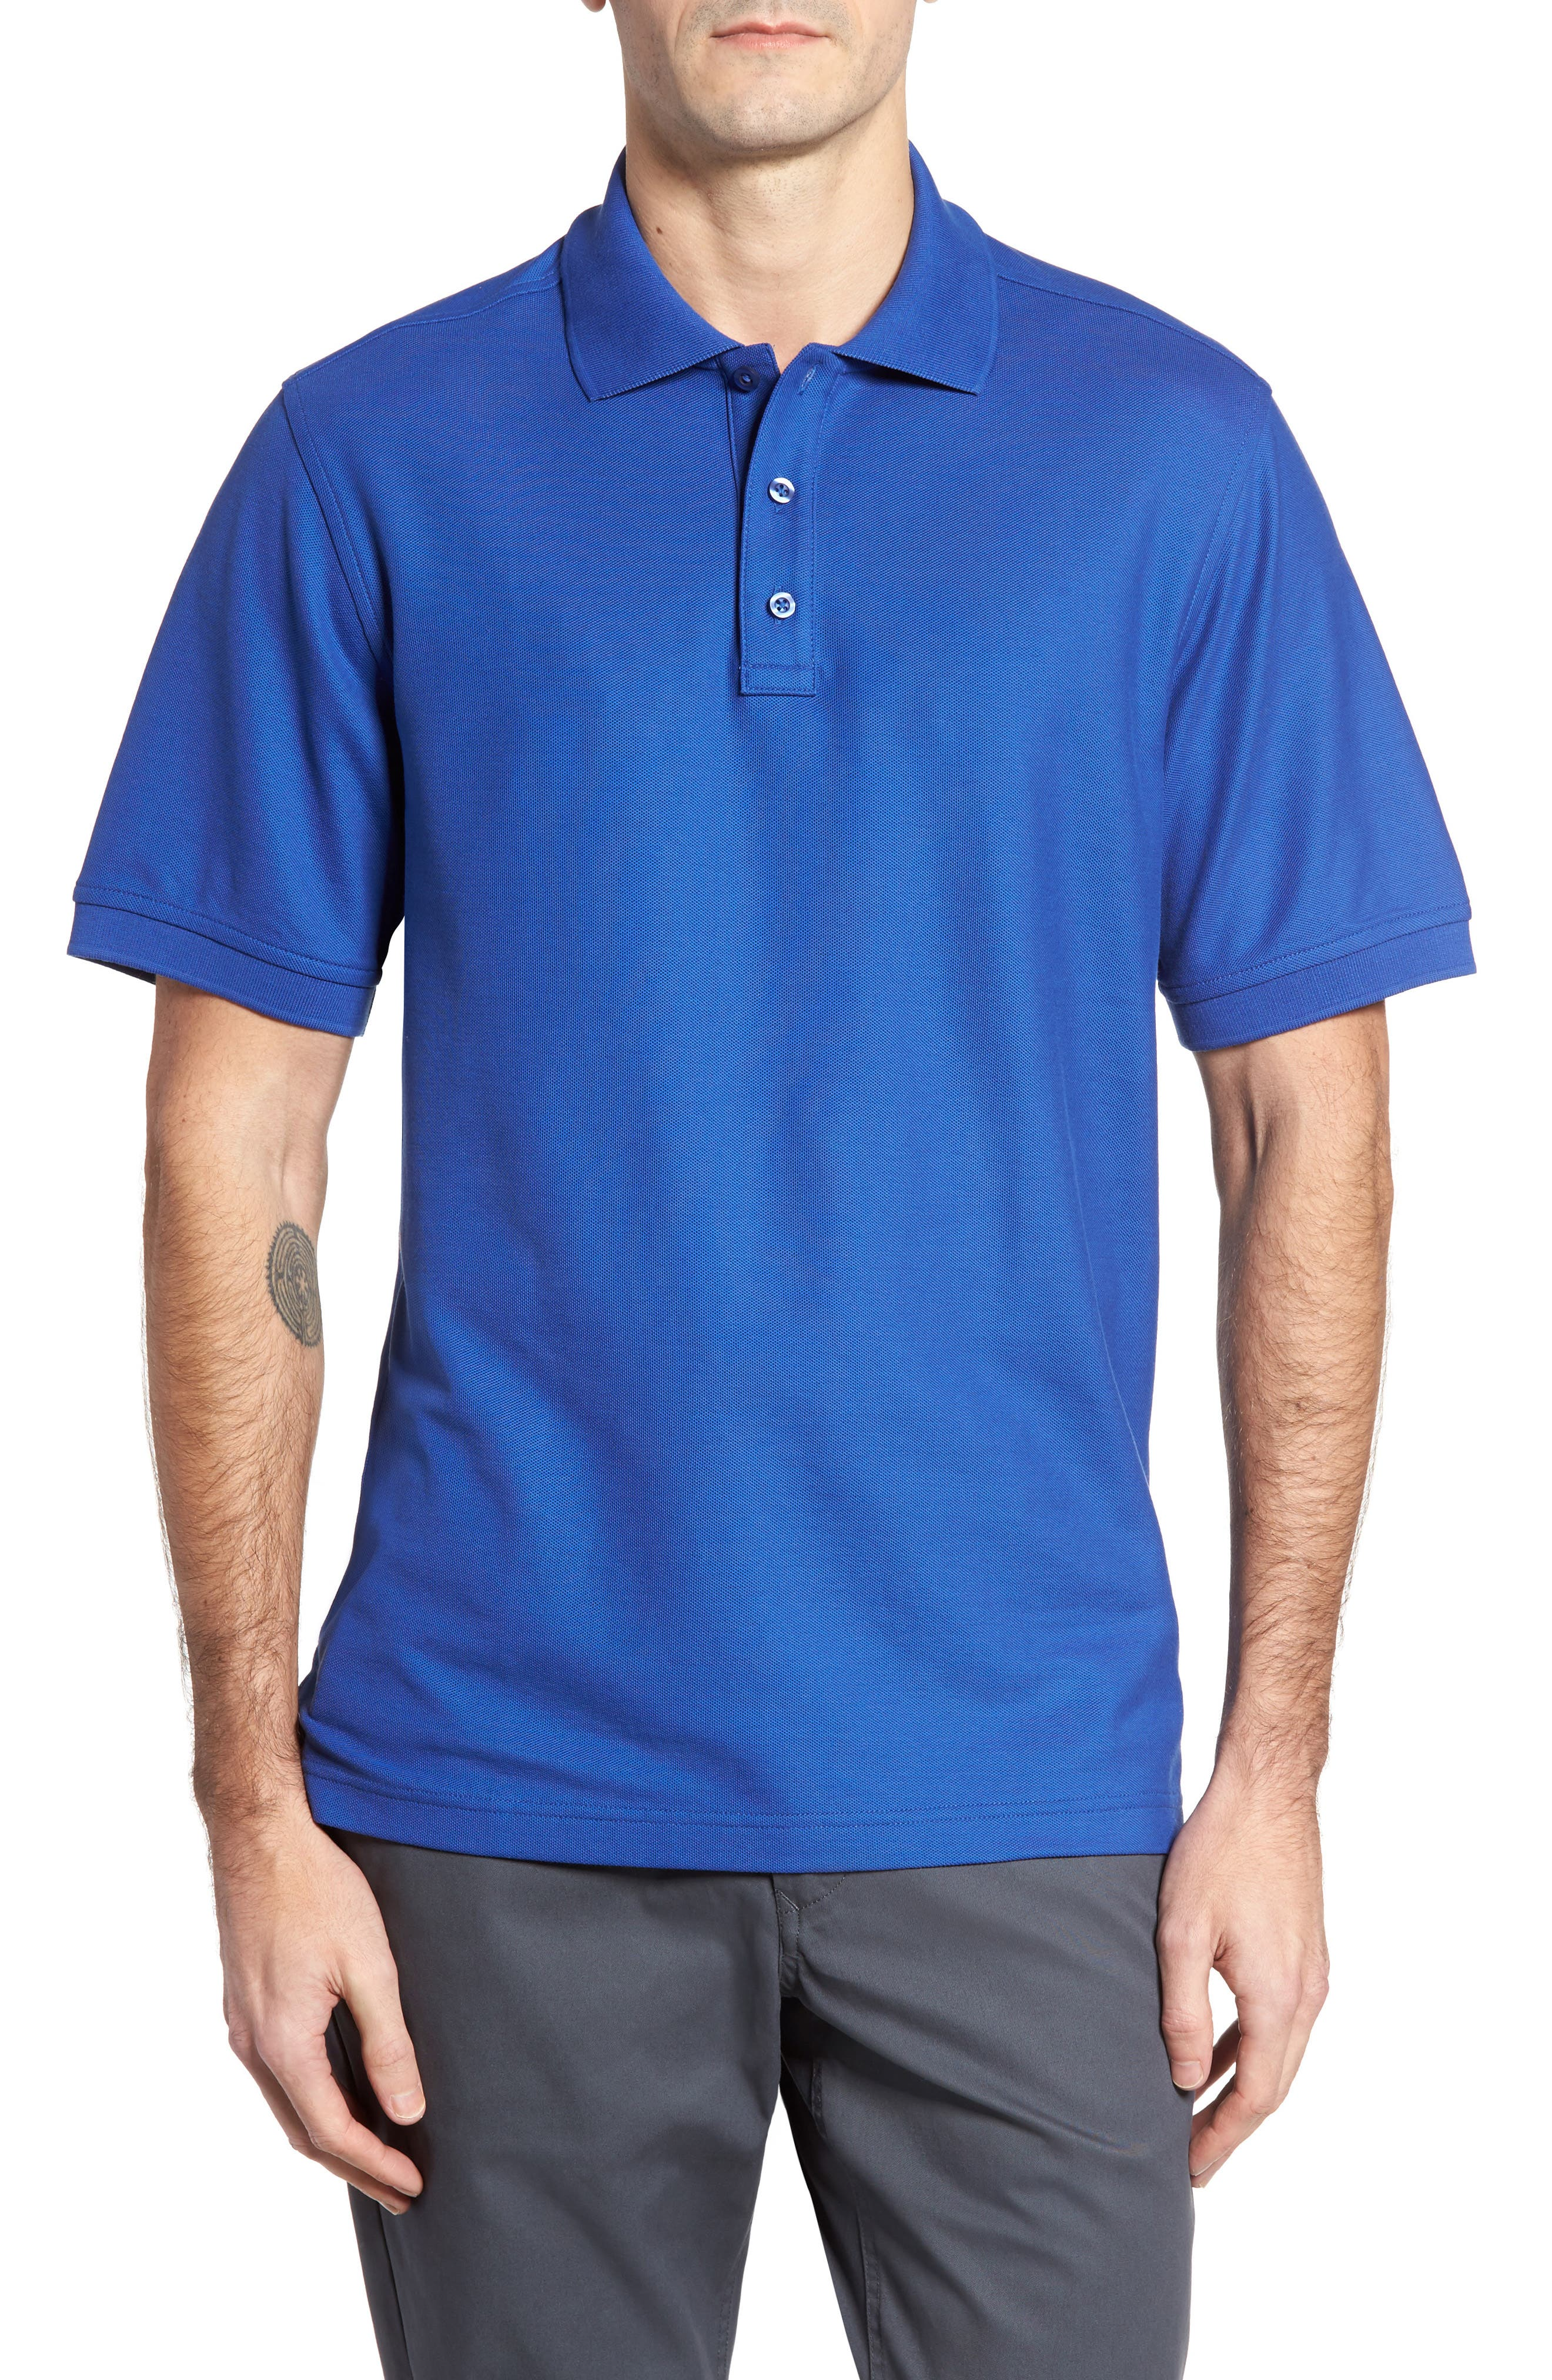 Alternate Image 1 Selected - Nordstrom Men's Shop 'Classic' Regular Fit Piqué Polo (Big)